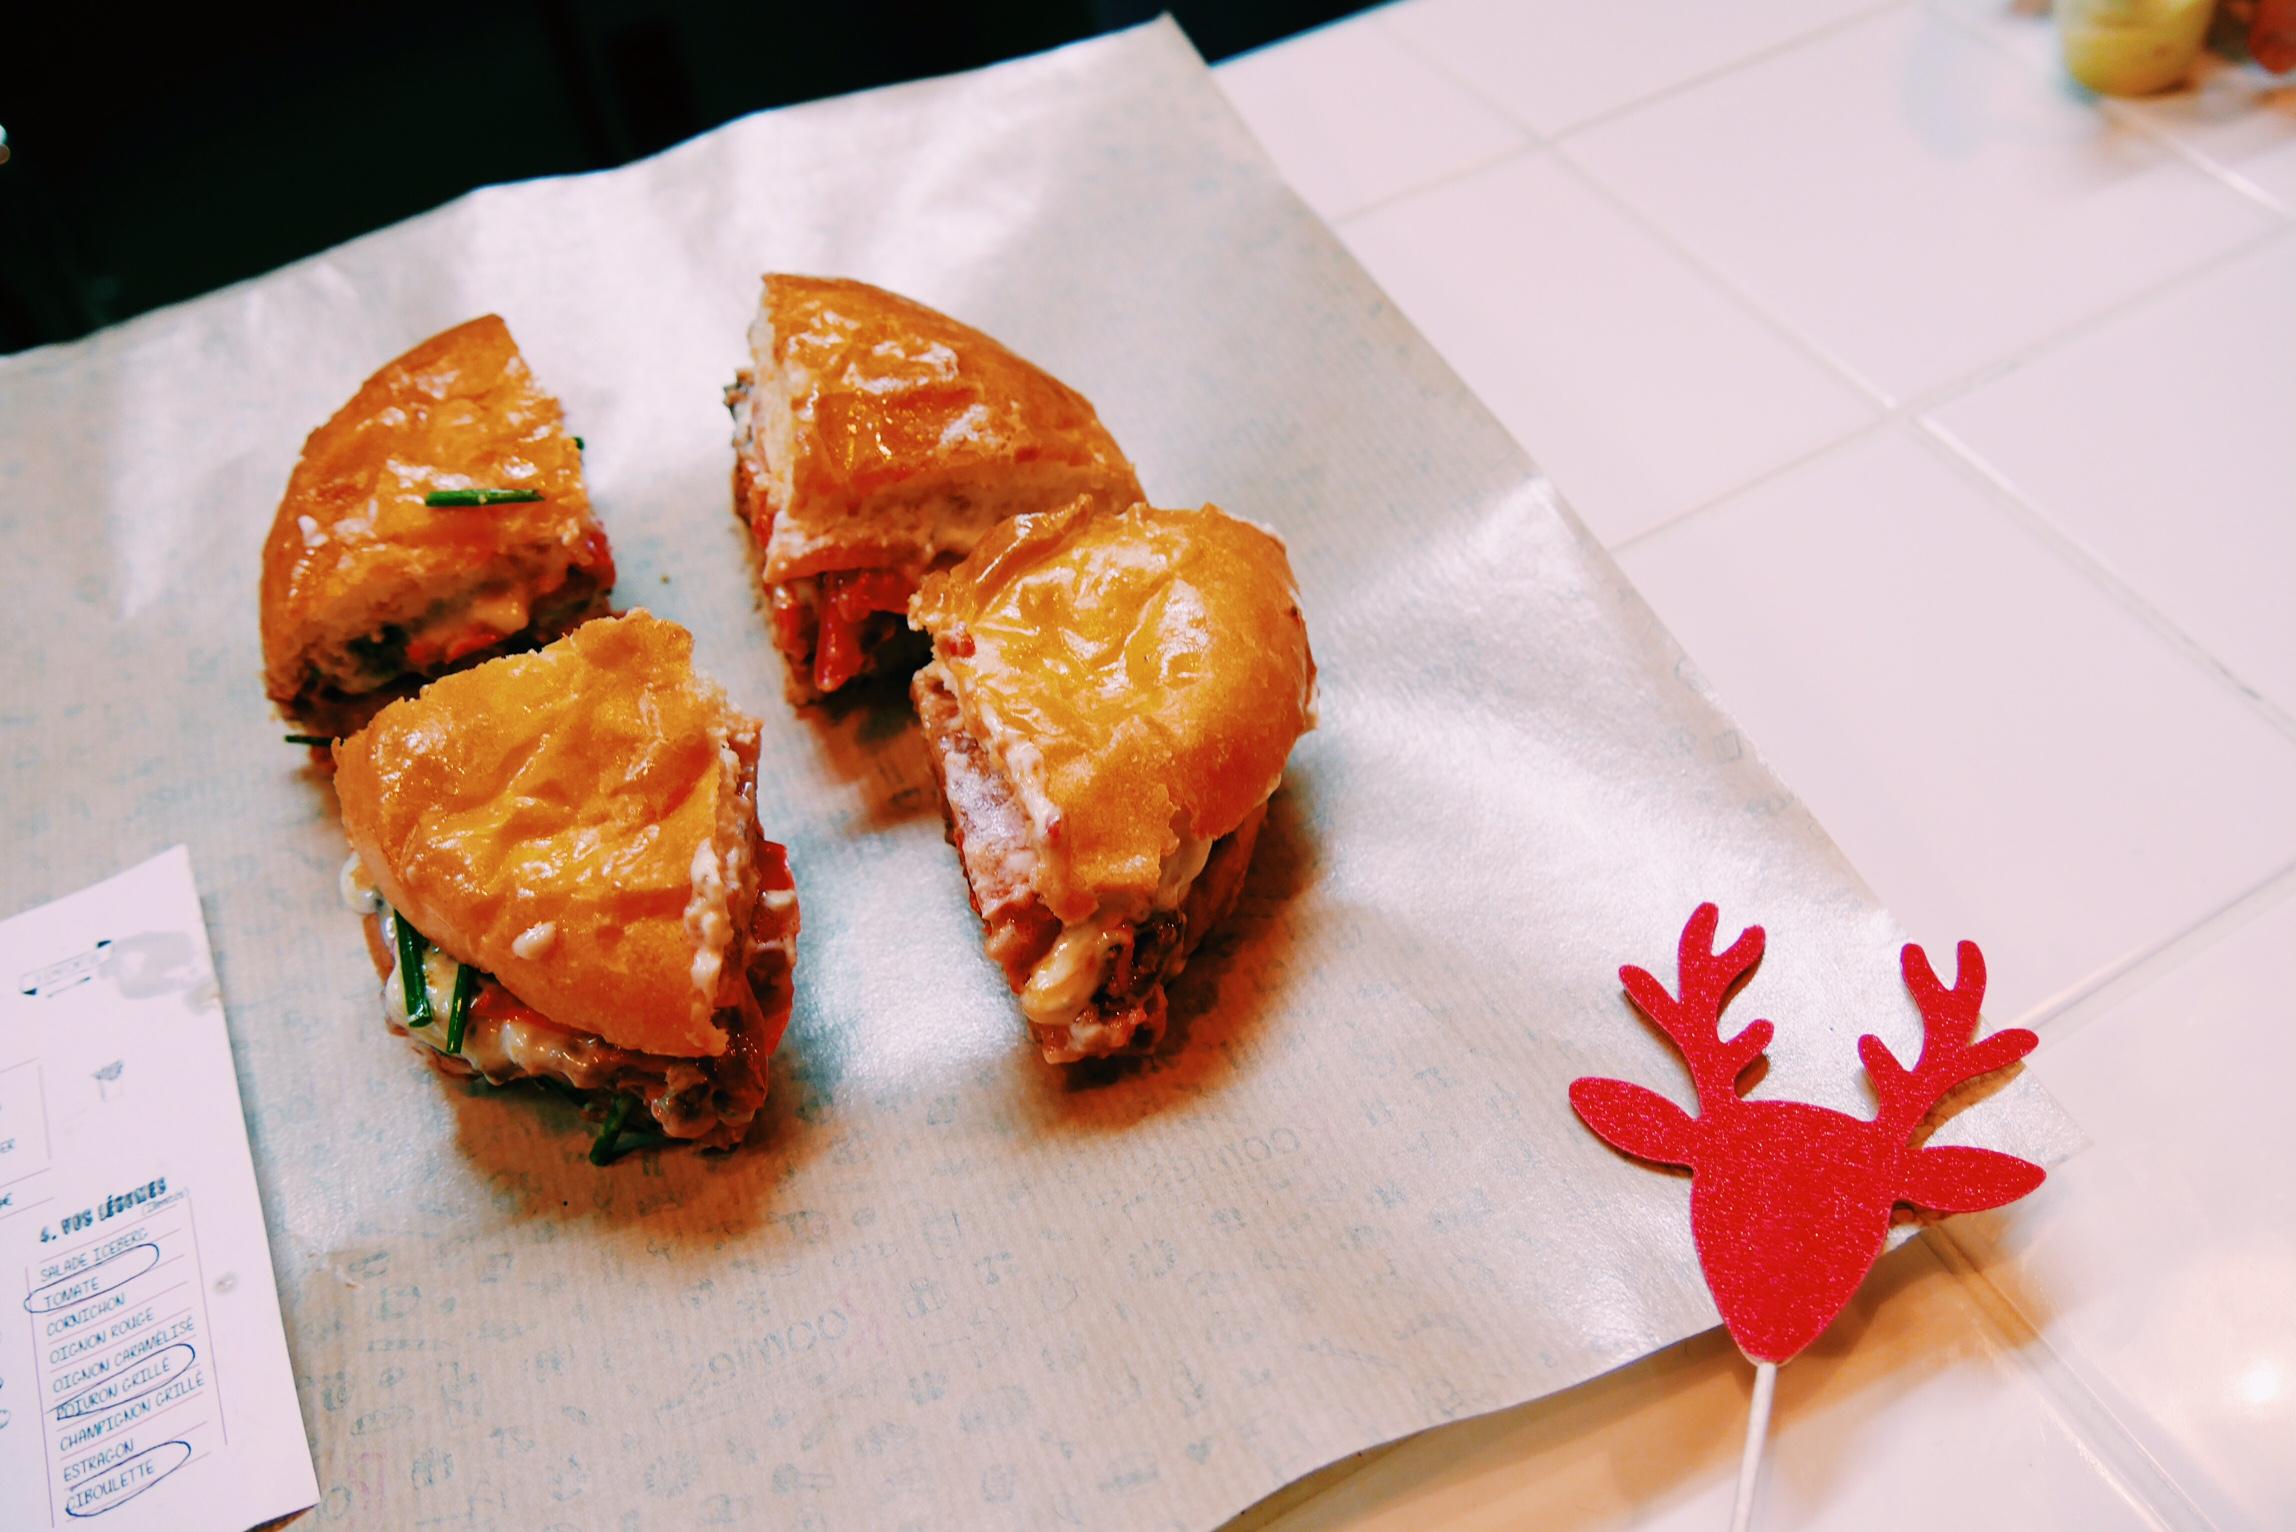 Burger-Roomies-Paris-dégustation-restaurant-avenue-Percier-photo-usofparis-blog